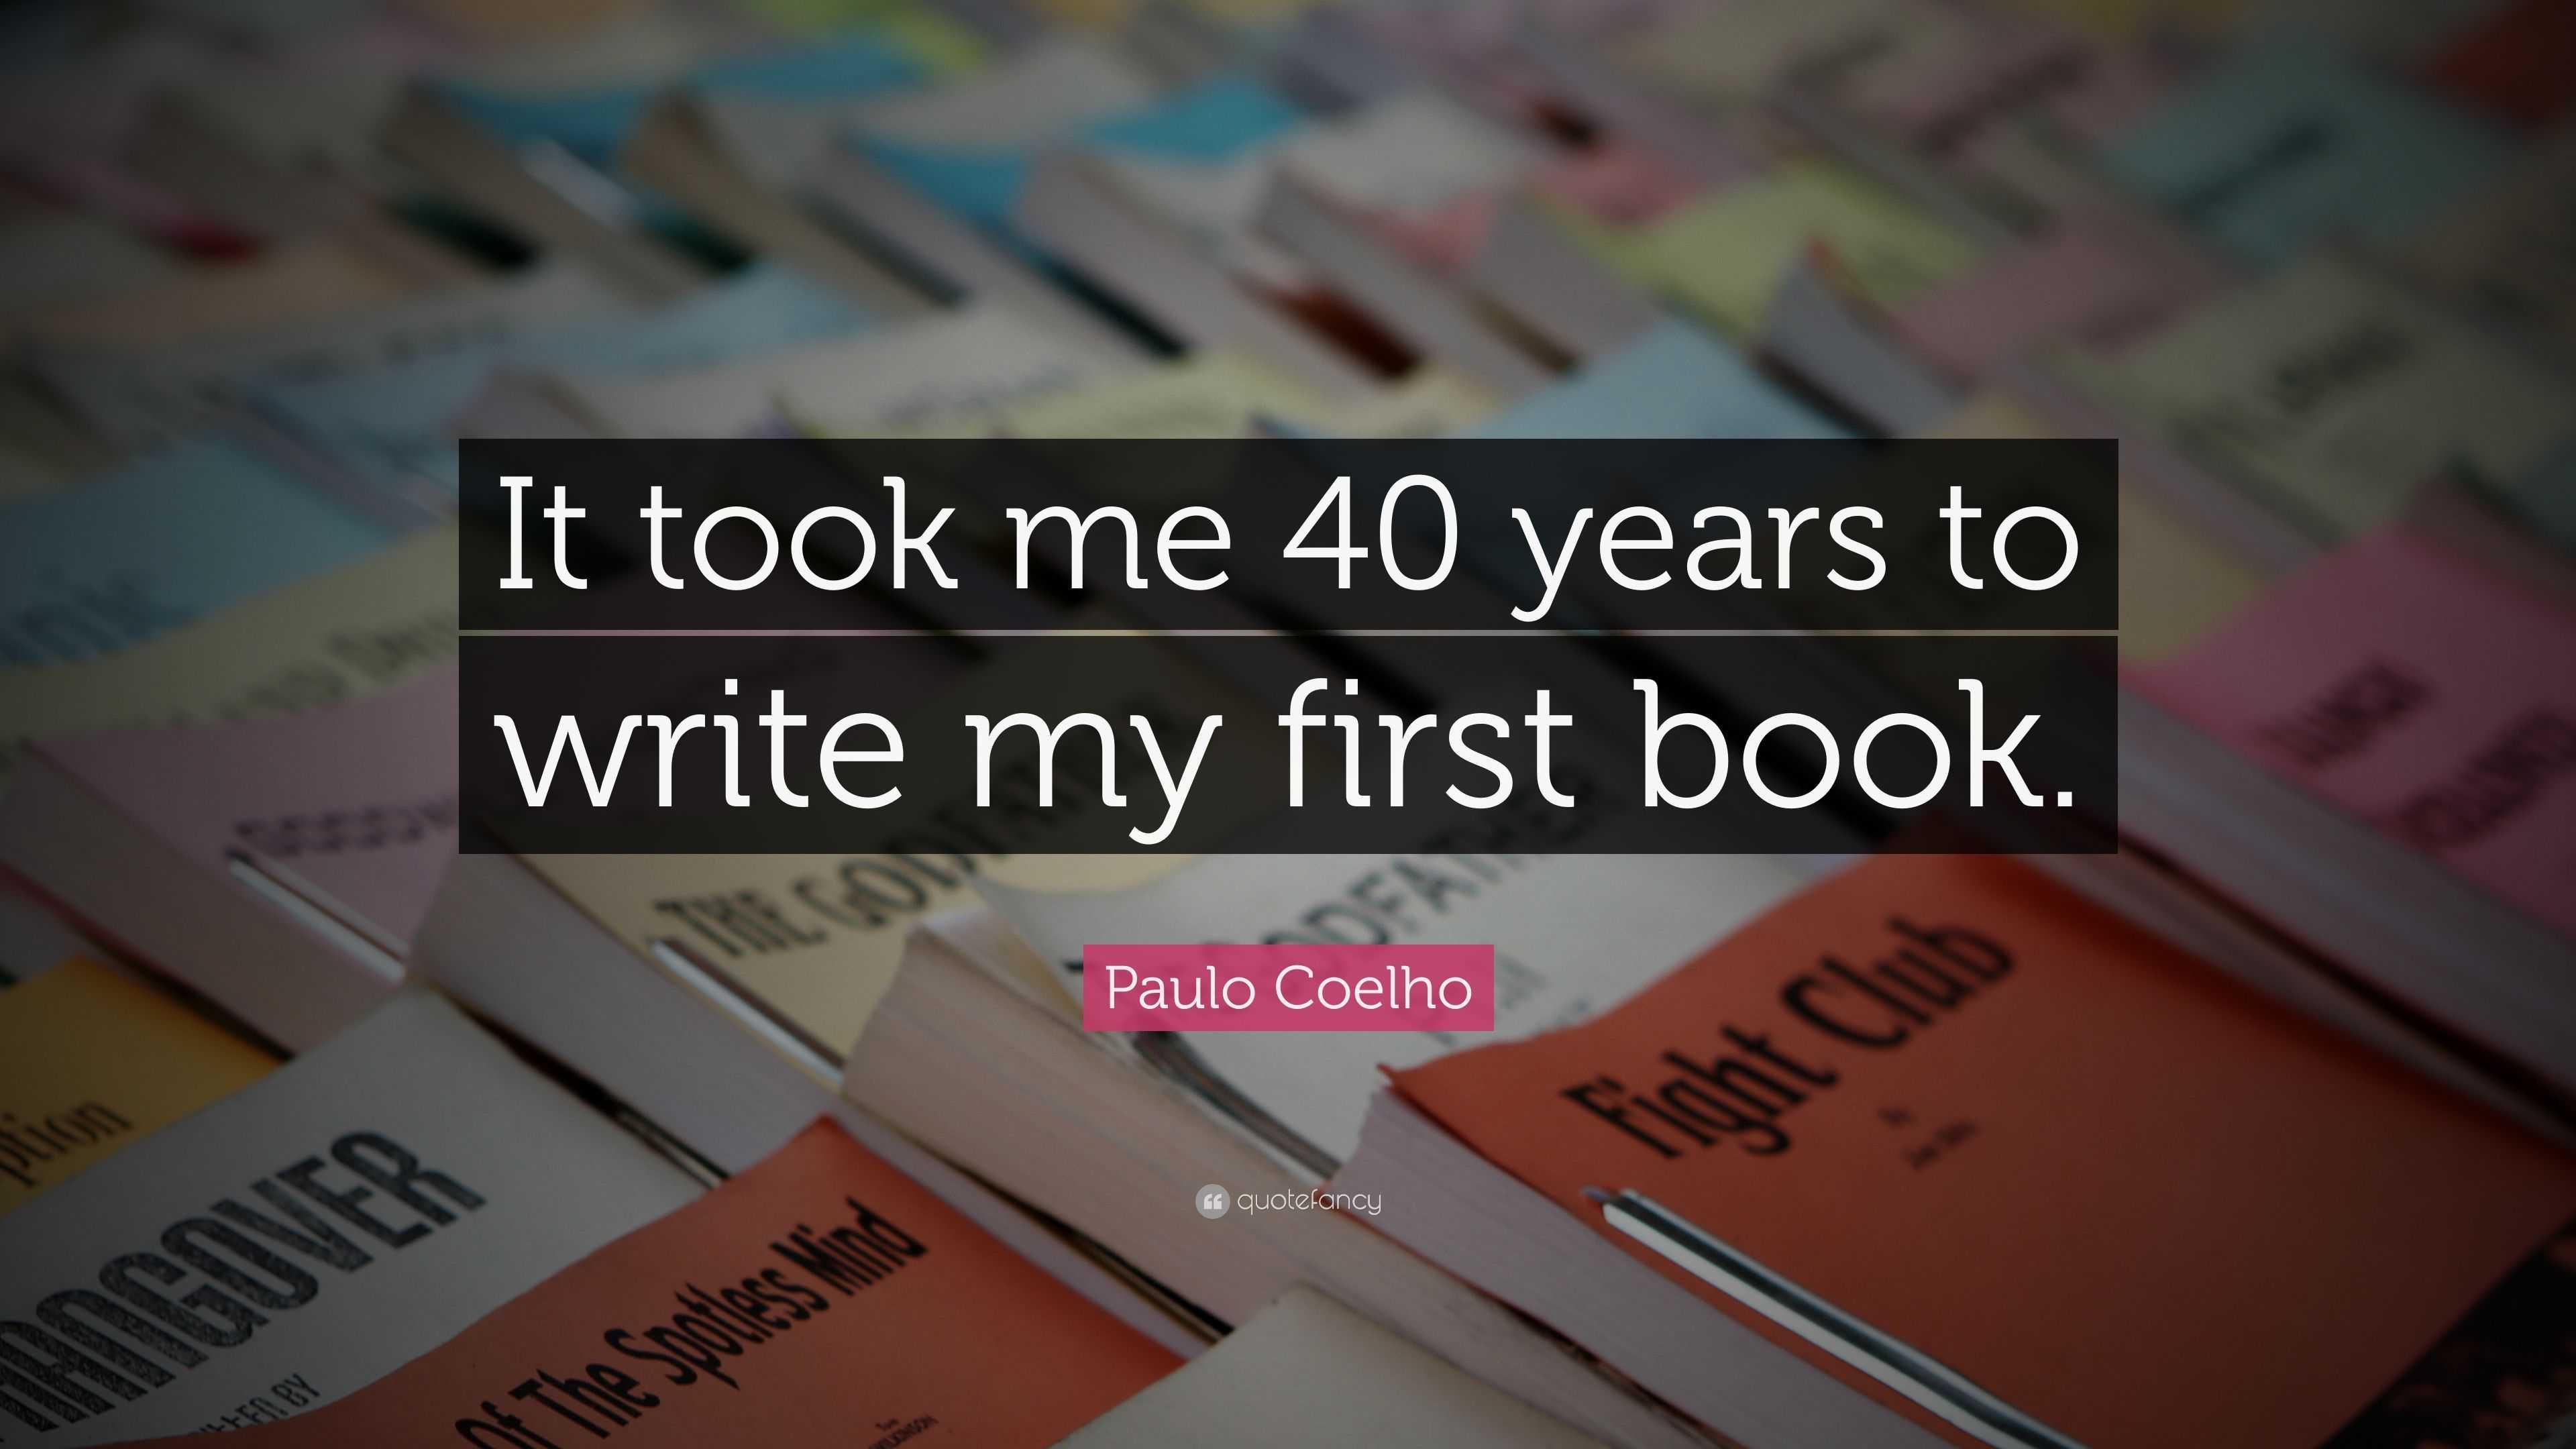 Get Help Writing a Book